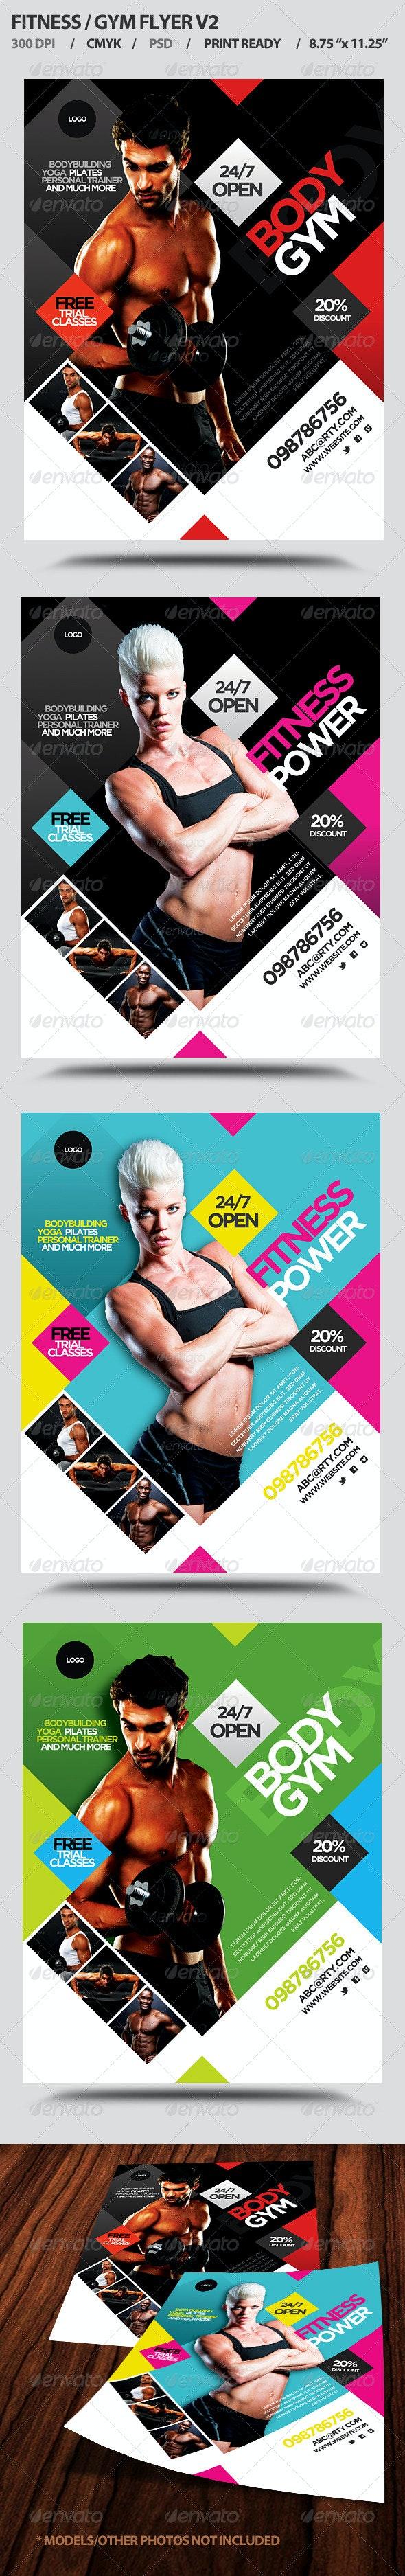 Fitness/Gym Business Promotion Flyer V2 - Flyers Print Templates